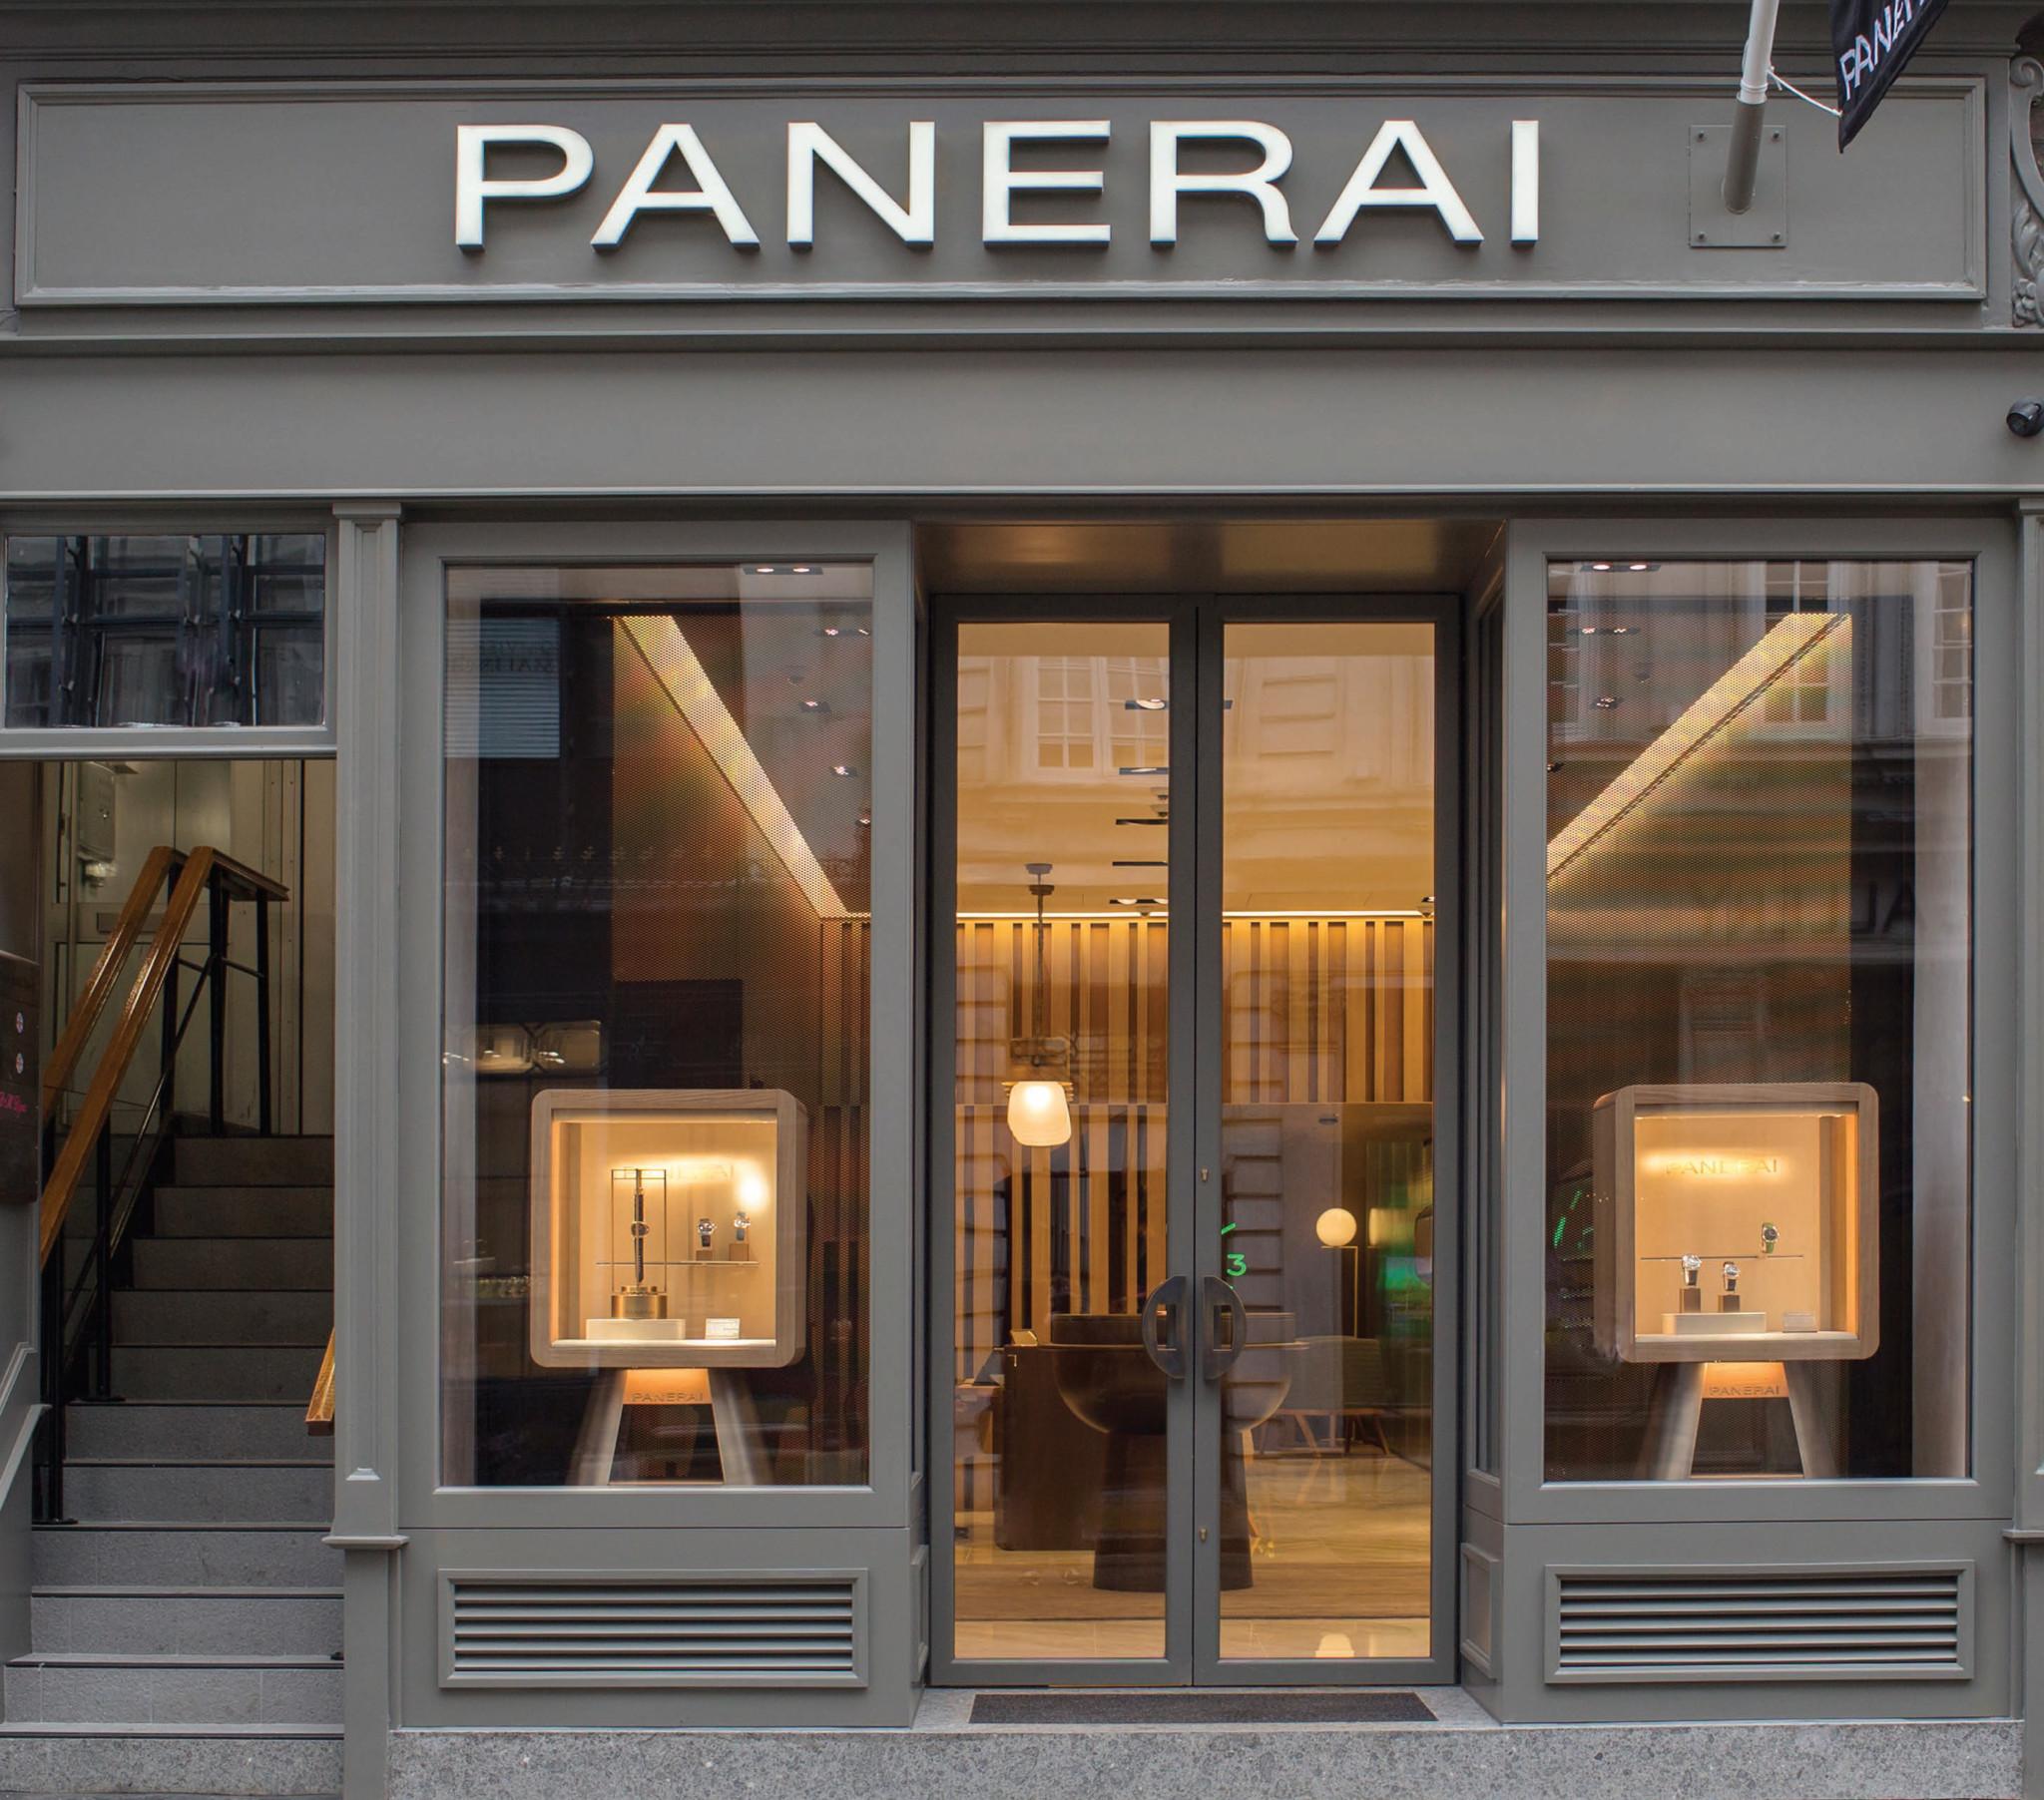 Panerai Bond Street store front